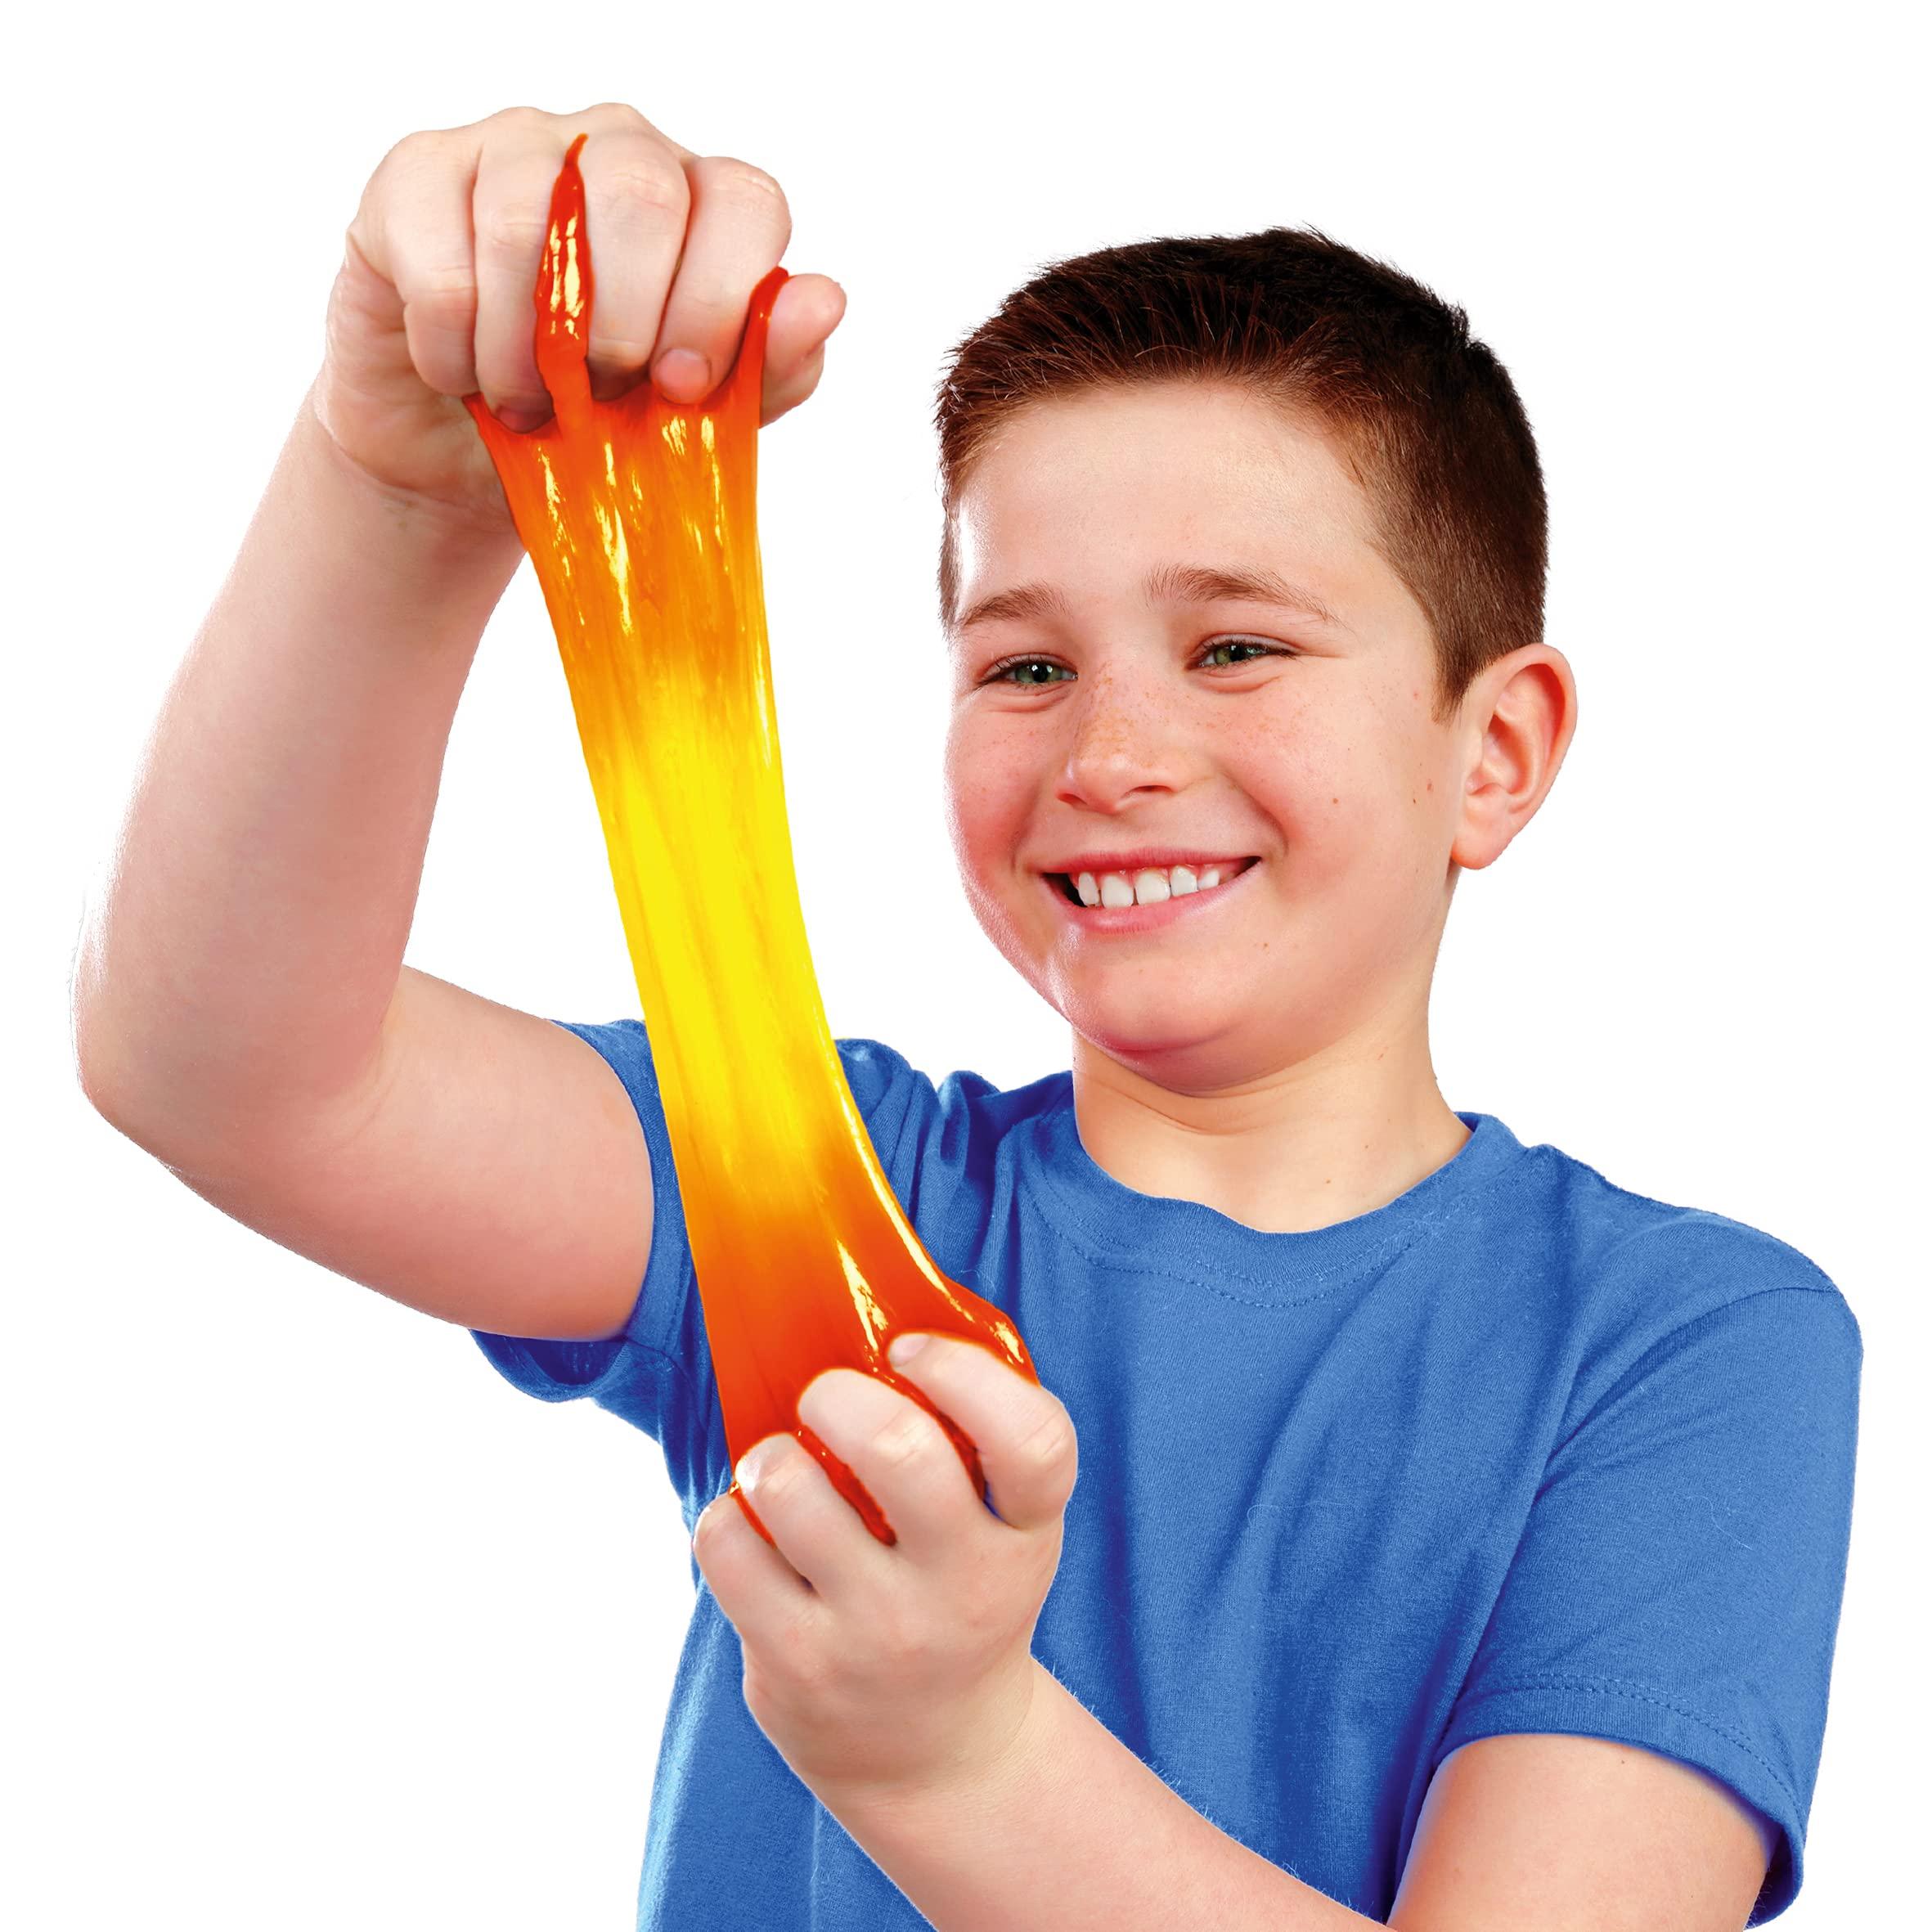 Nickelodeon 674 19298 EA Slime Extravaganza, red